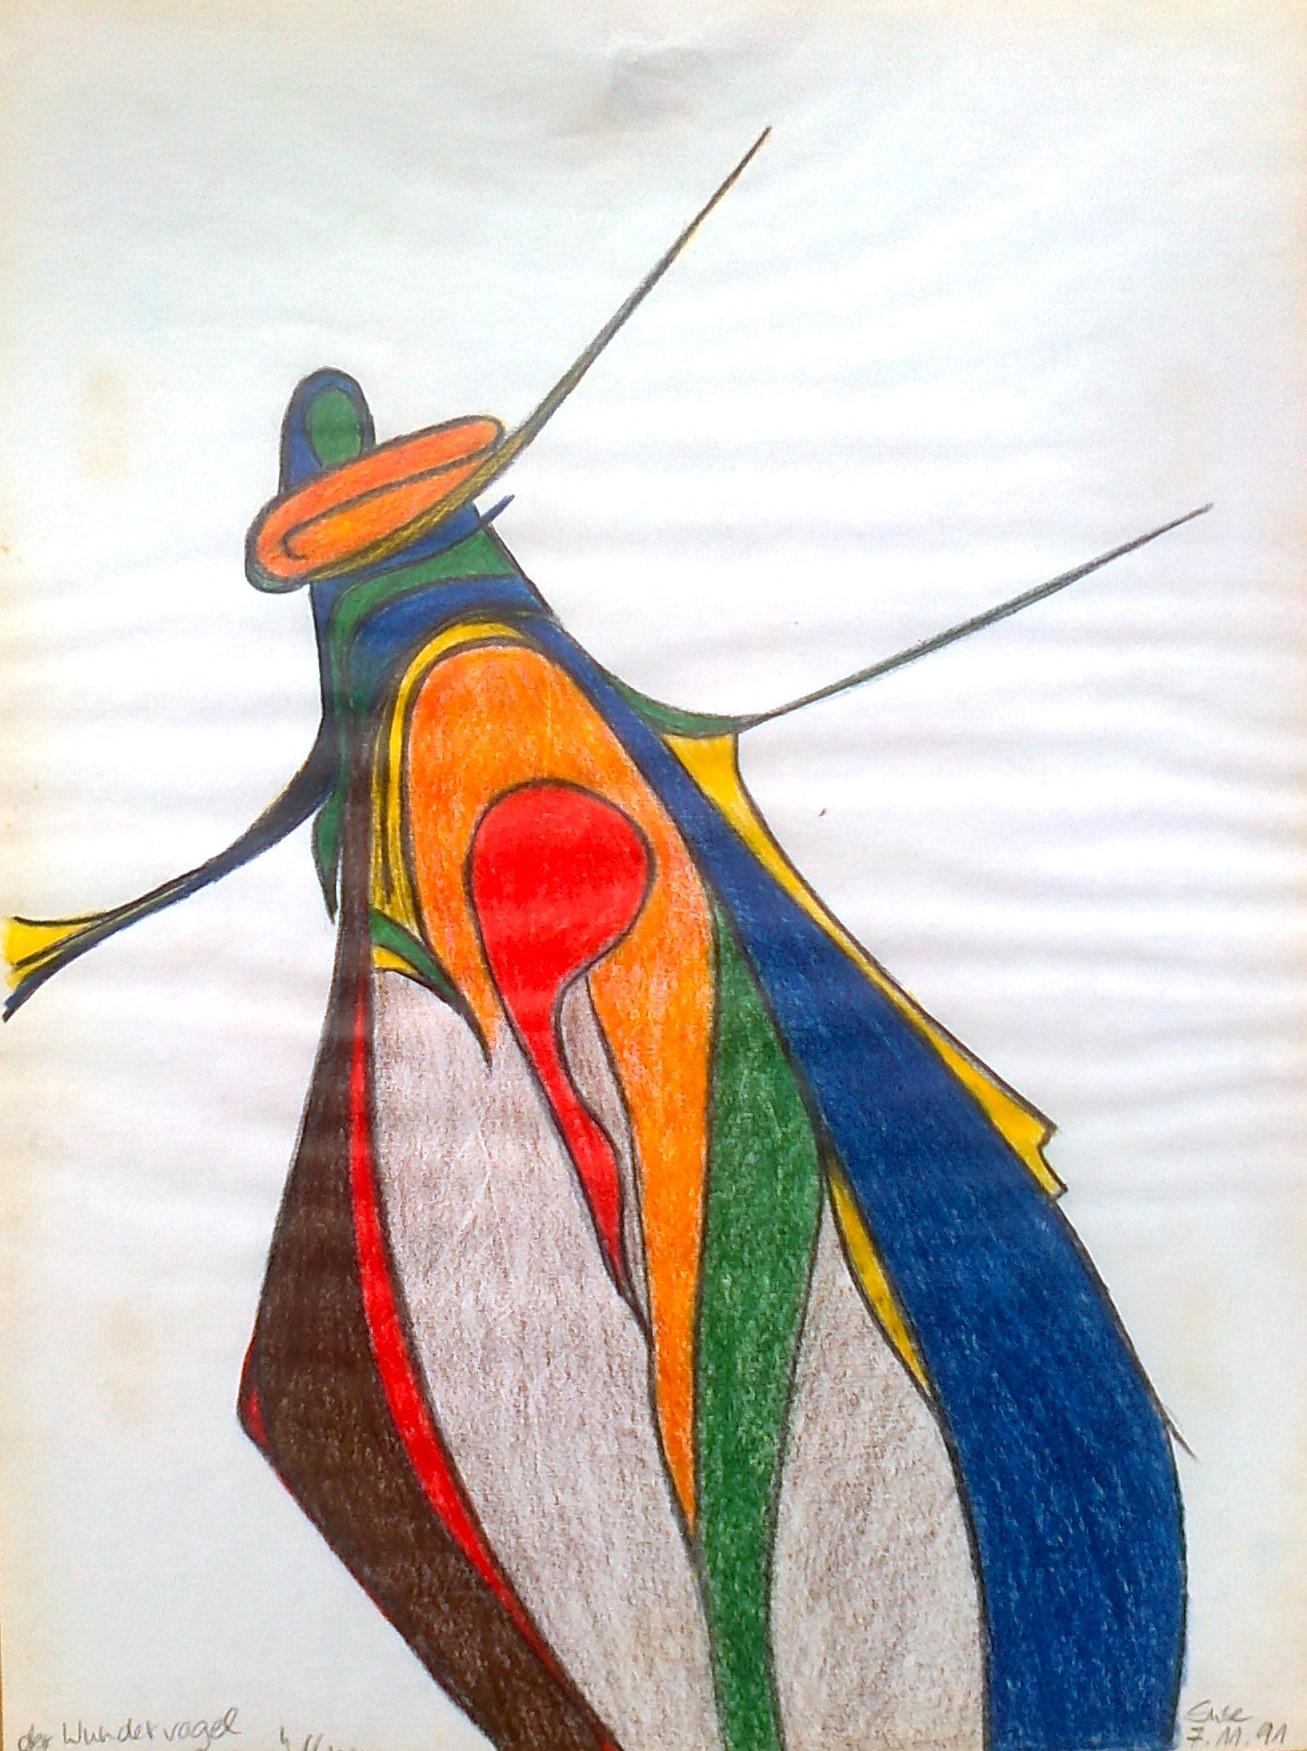 Wundervogel öffnet sich